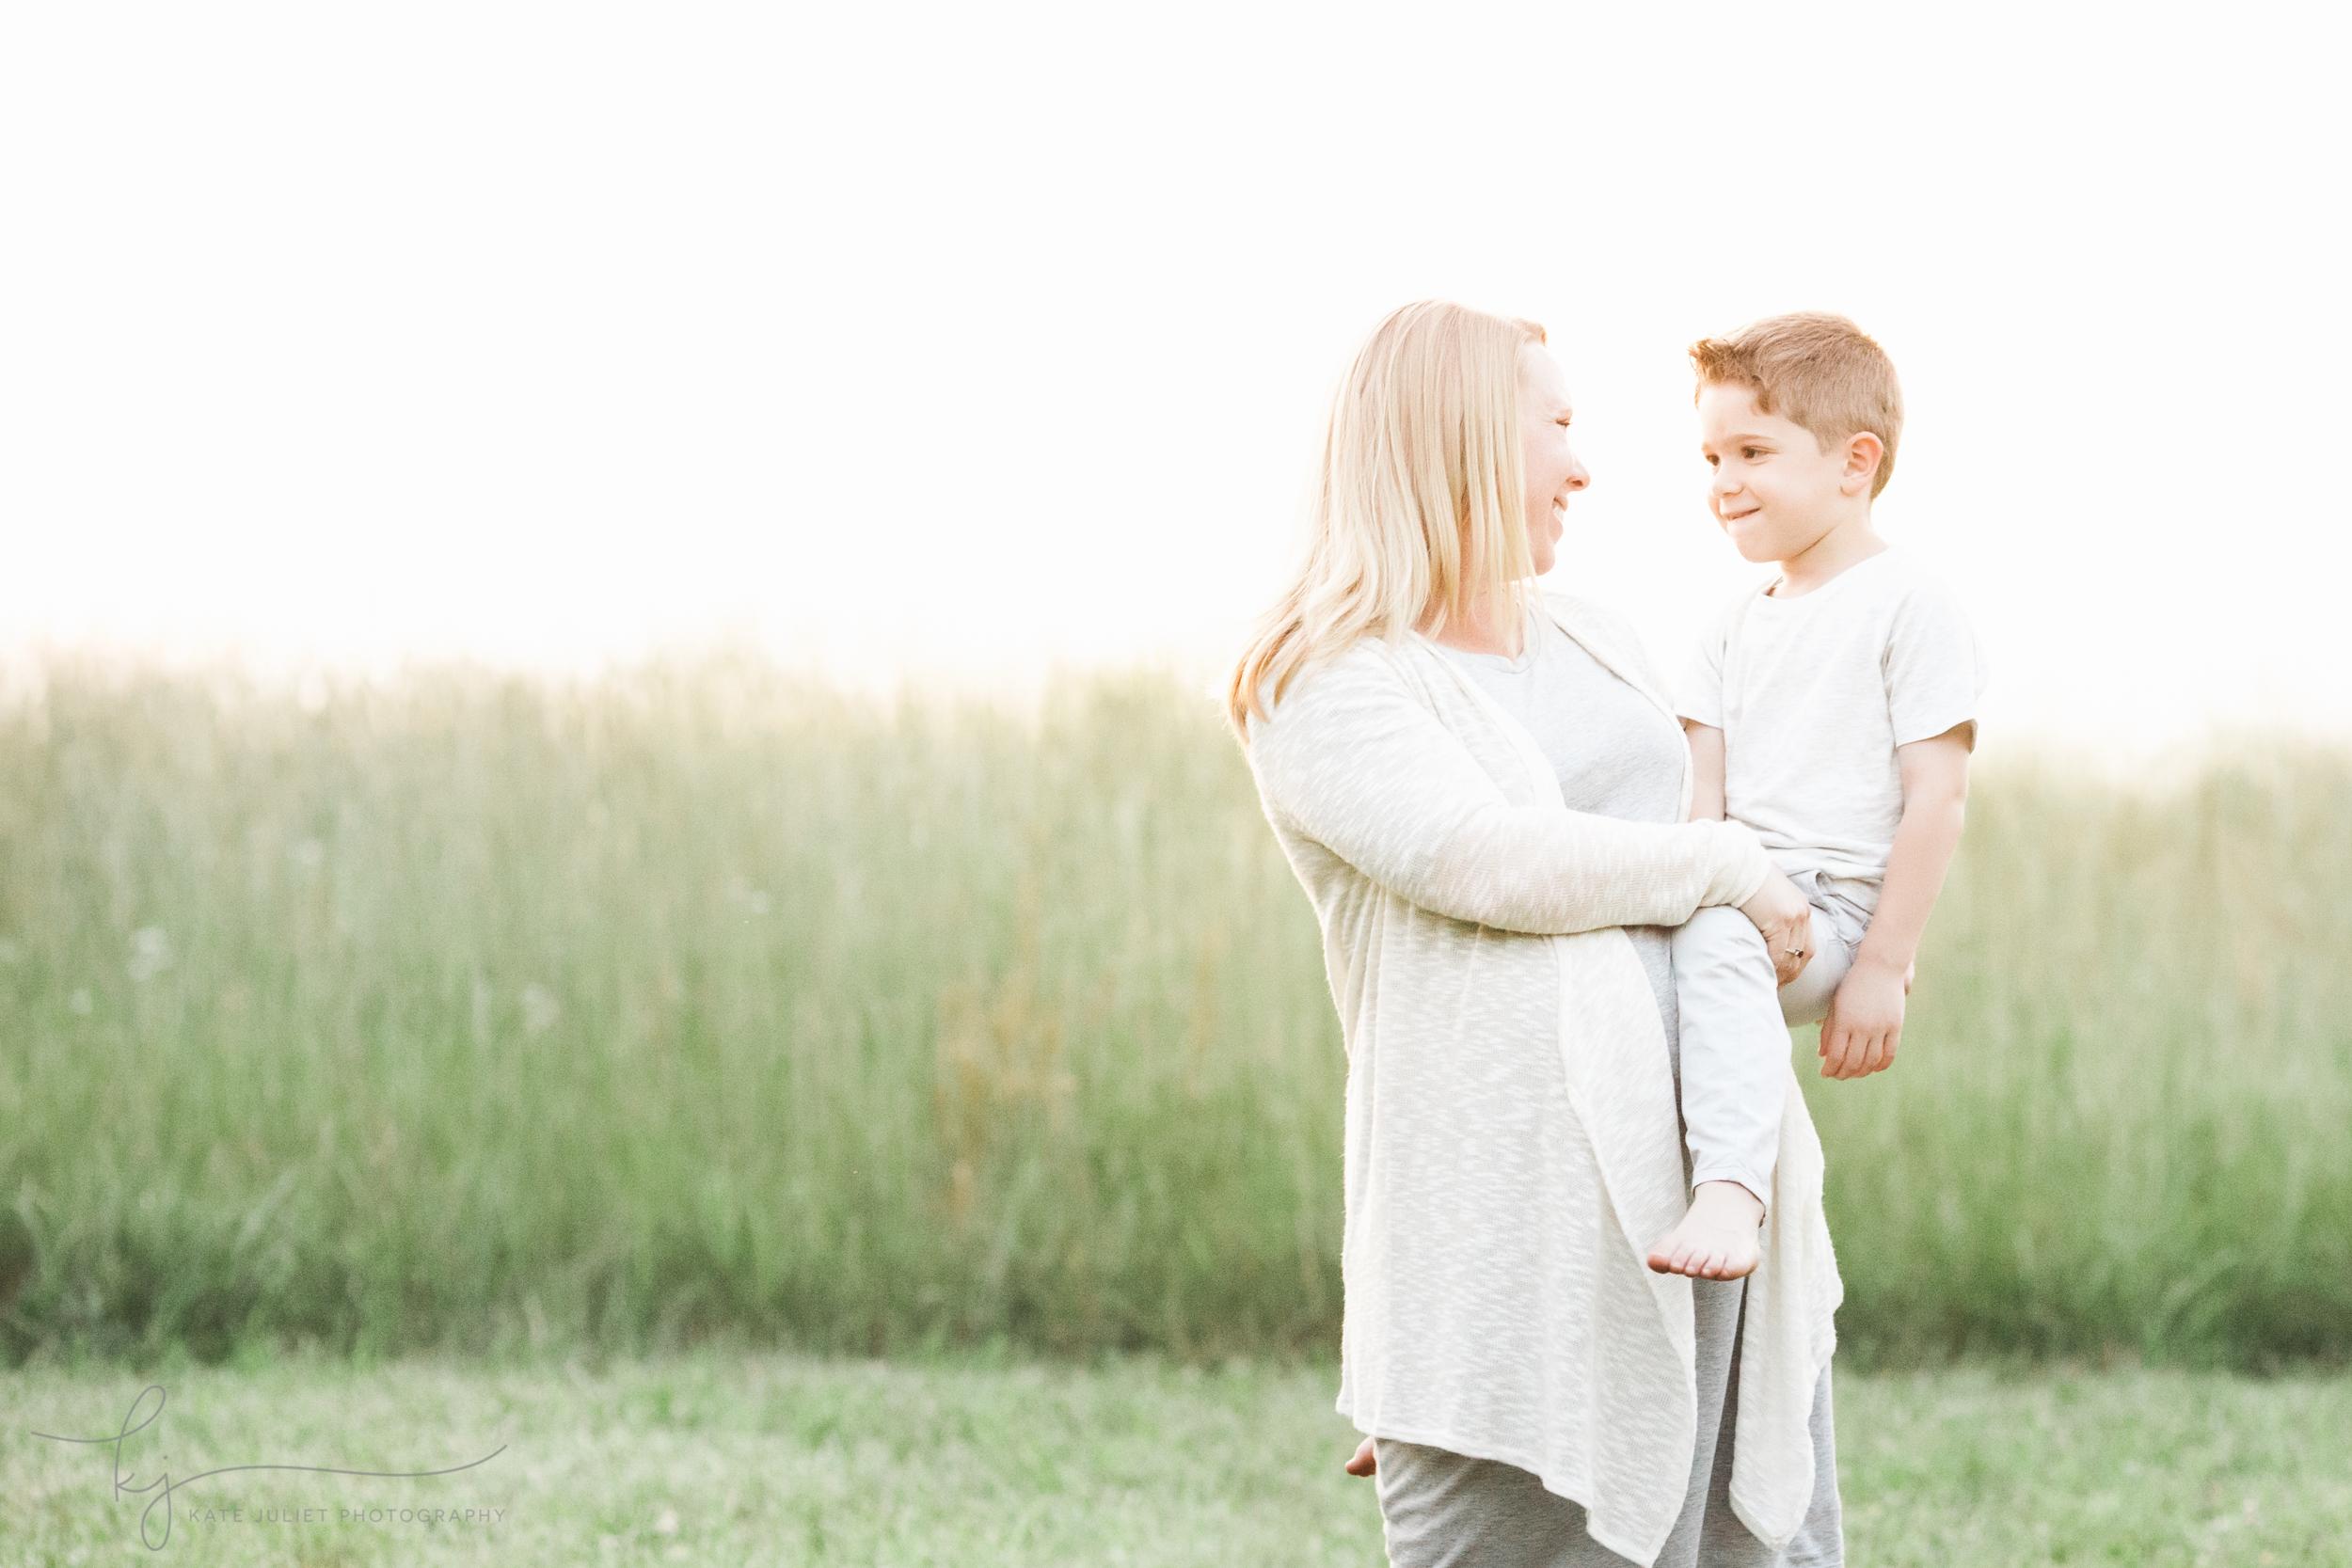 Fairfax VA Family Maternity Photographer | Kate Juliet Photography